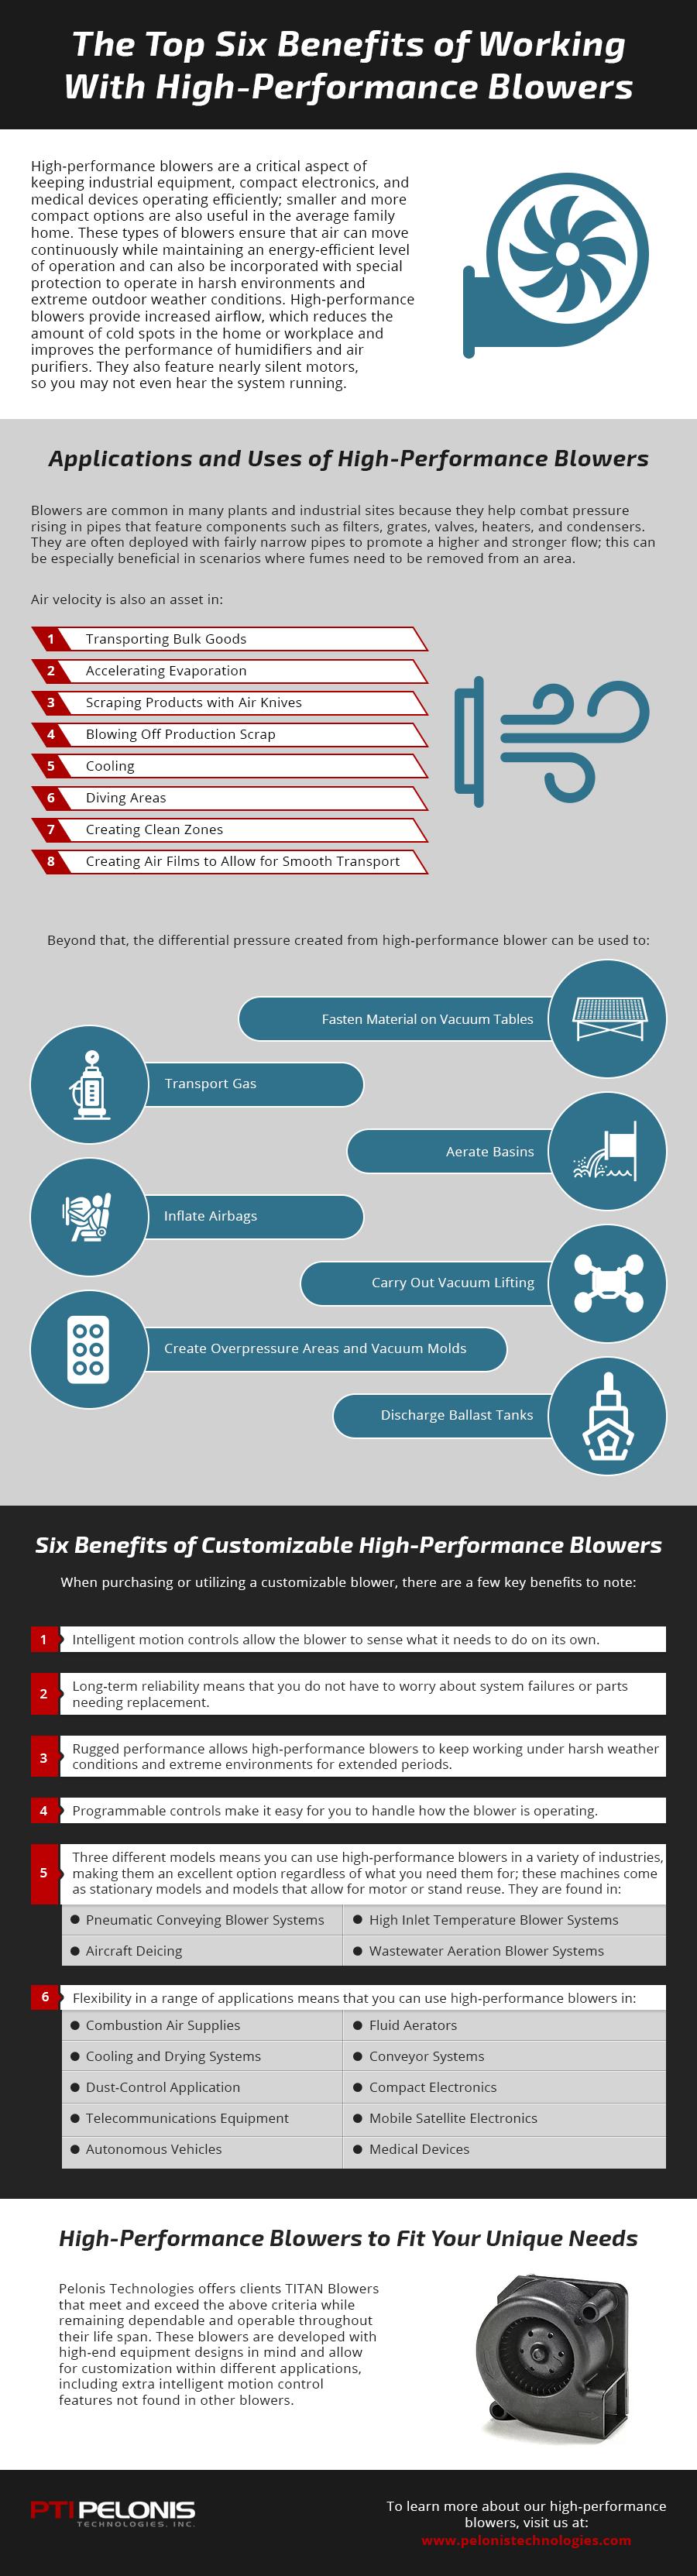 Six Benefits of High Performance Blowers